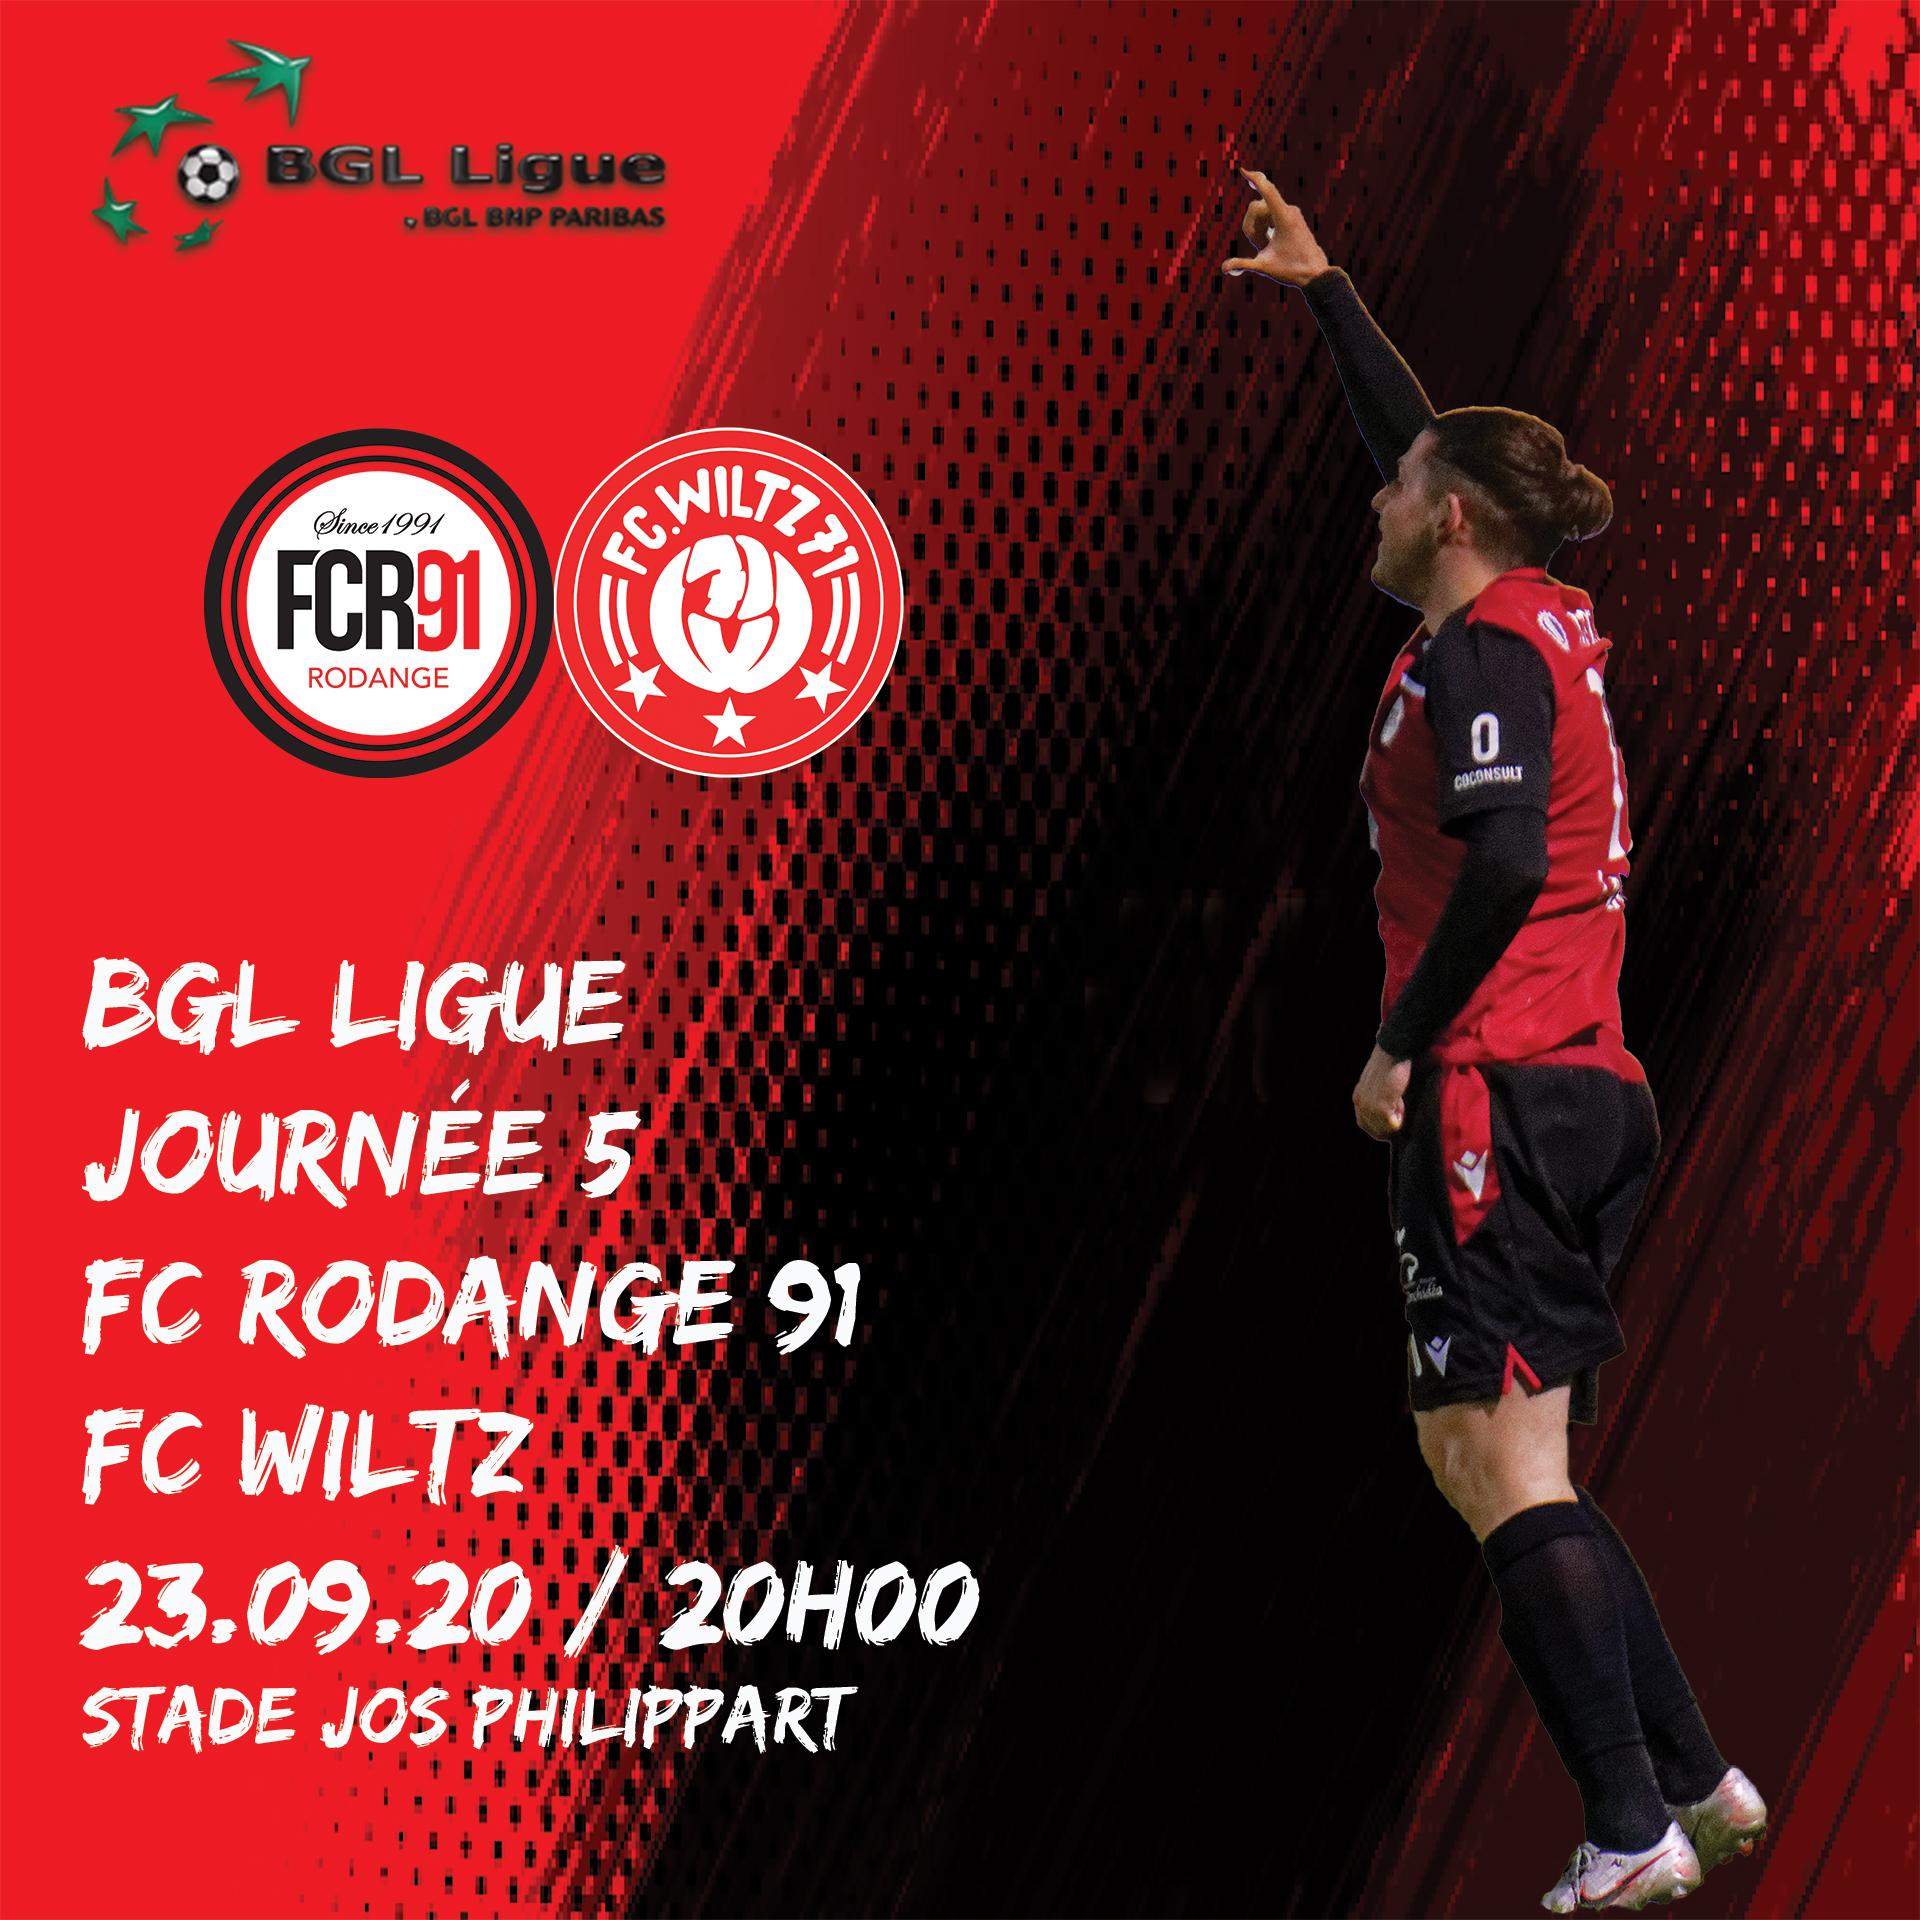 FC Rodange 91 - FC Wiltz 32